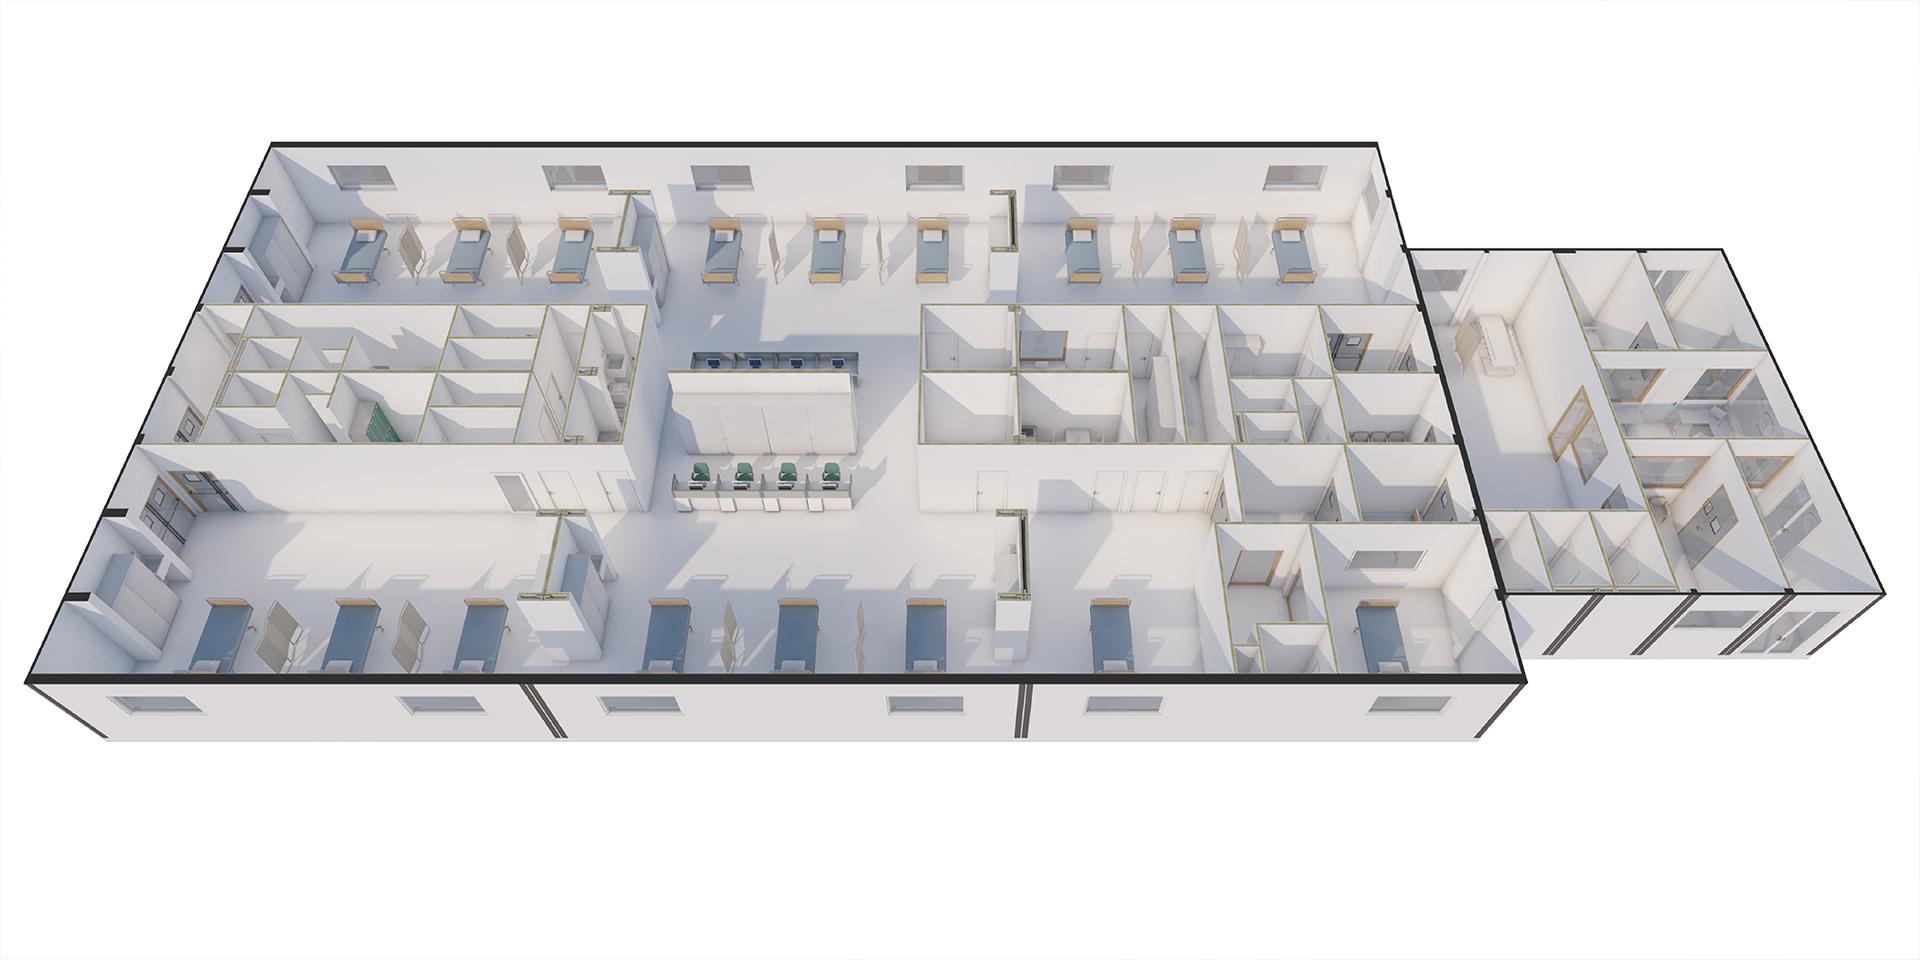 Speed Hospital, Binini Partners, Società di architettura e ingegneria